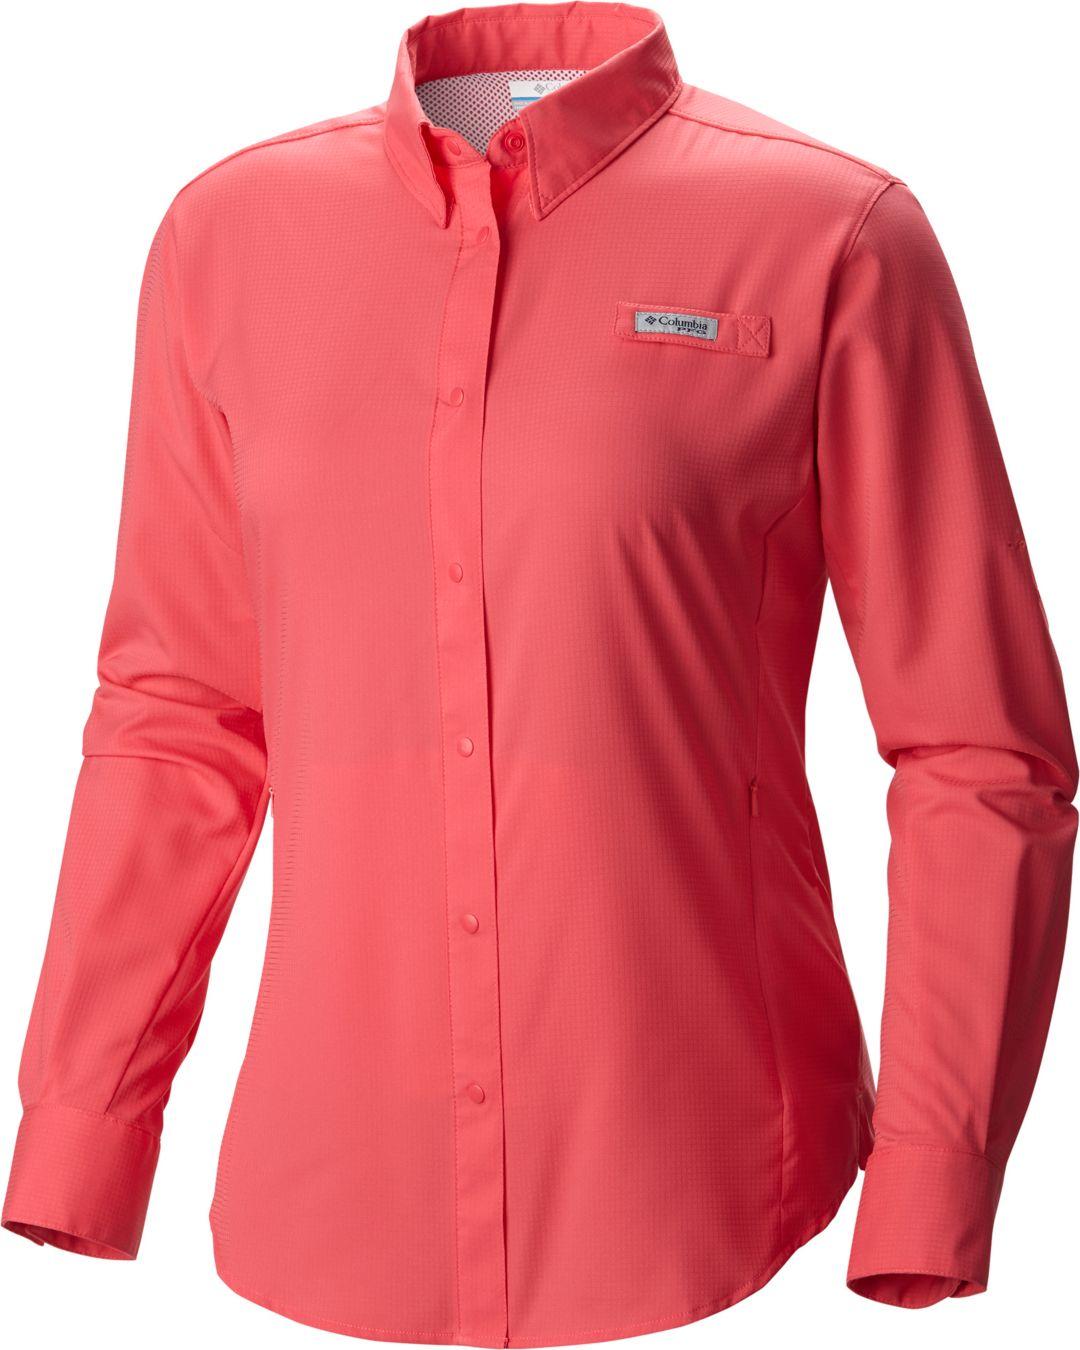 8e5c8ae7934 Columbia Women's PFG Tamiami II Long Sleeve Shirt | Field & Stream